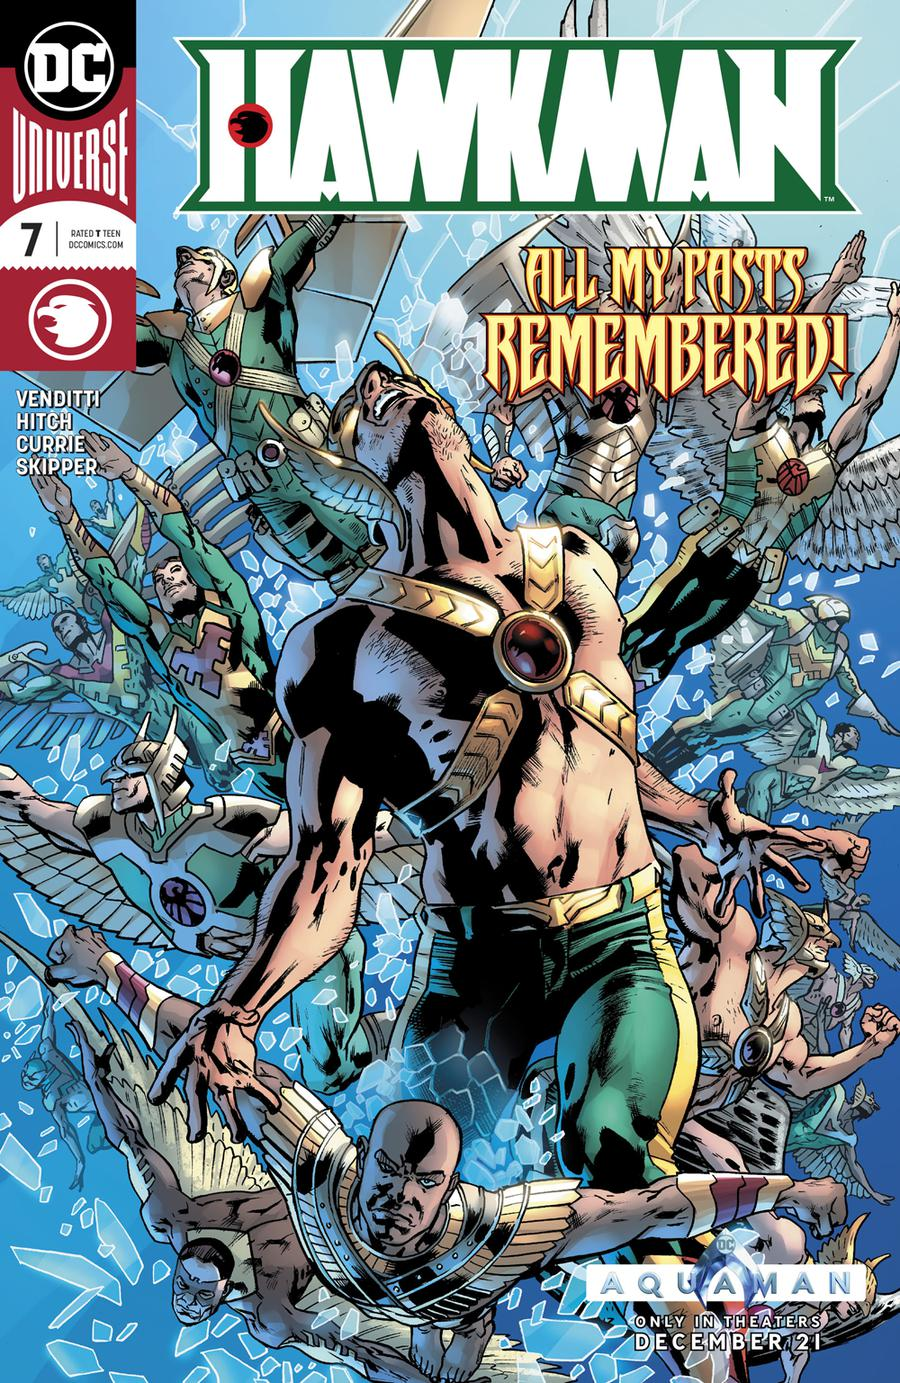 Hawkman Vol 5 #7 Cover A Regular Bryan Hitch Cover